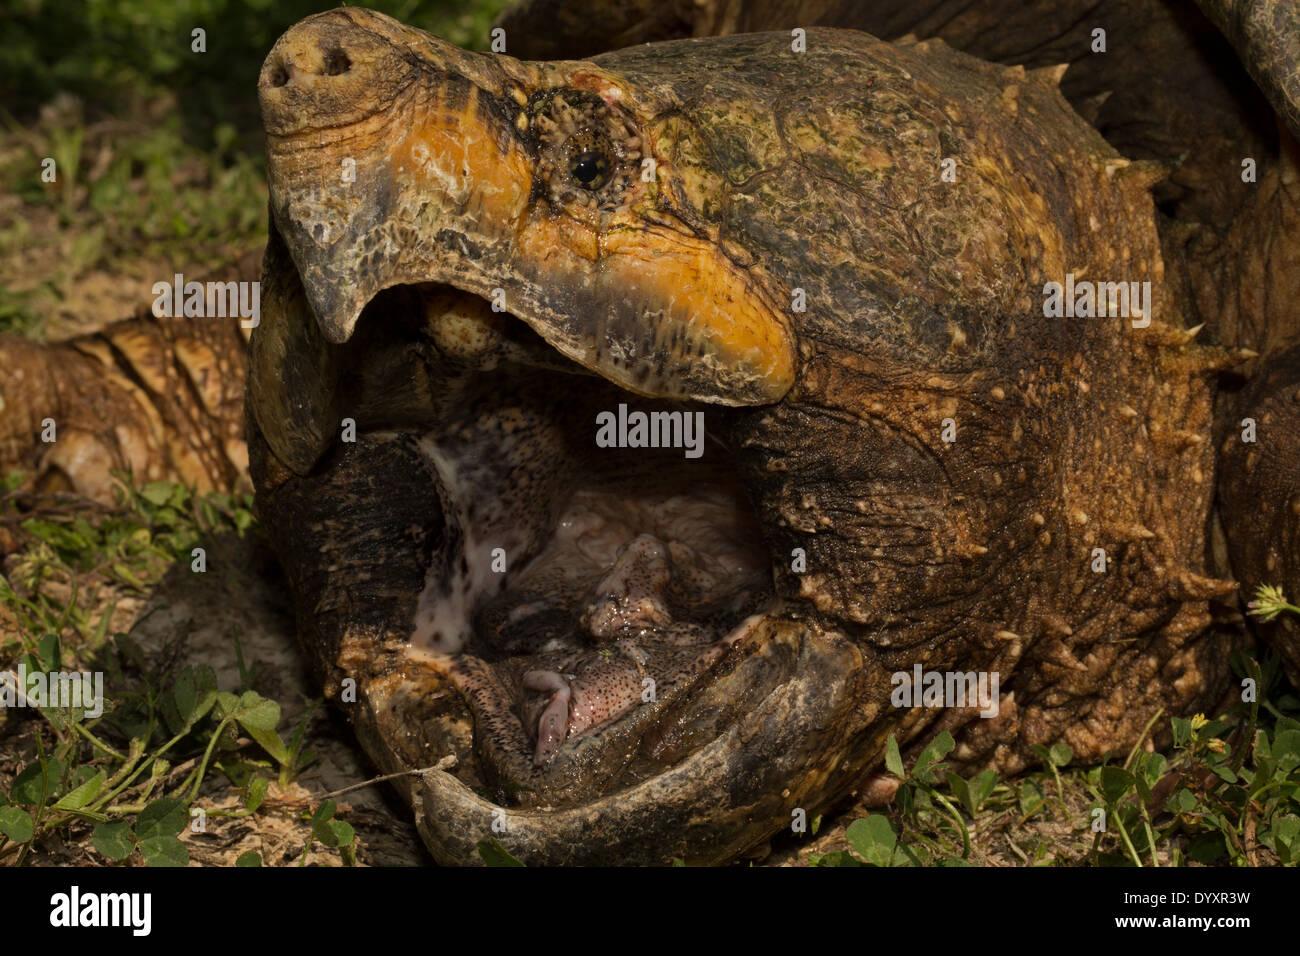 Alligator snapping turtle (Macrochelys temminckii) is the ...  Alligator snapp...